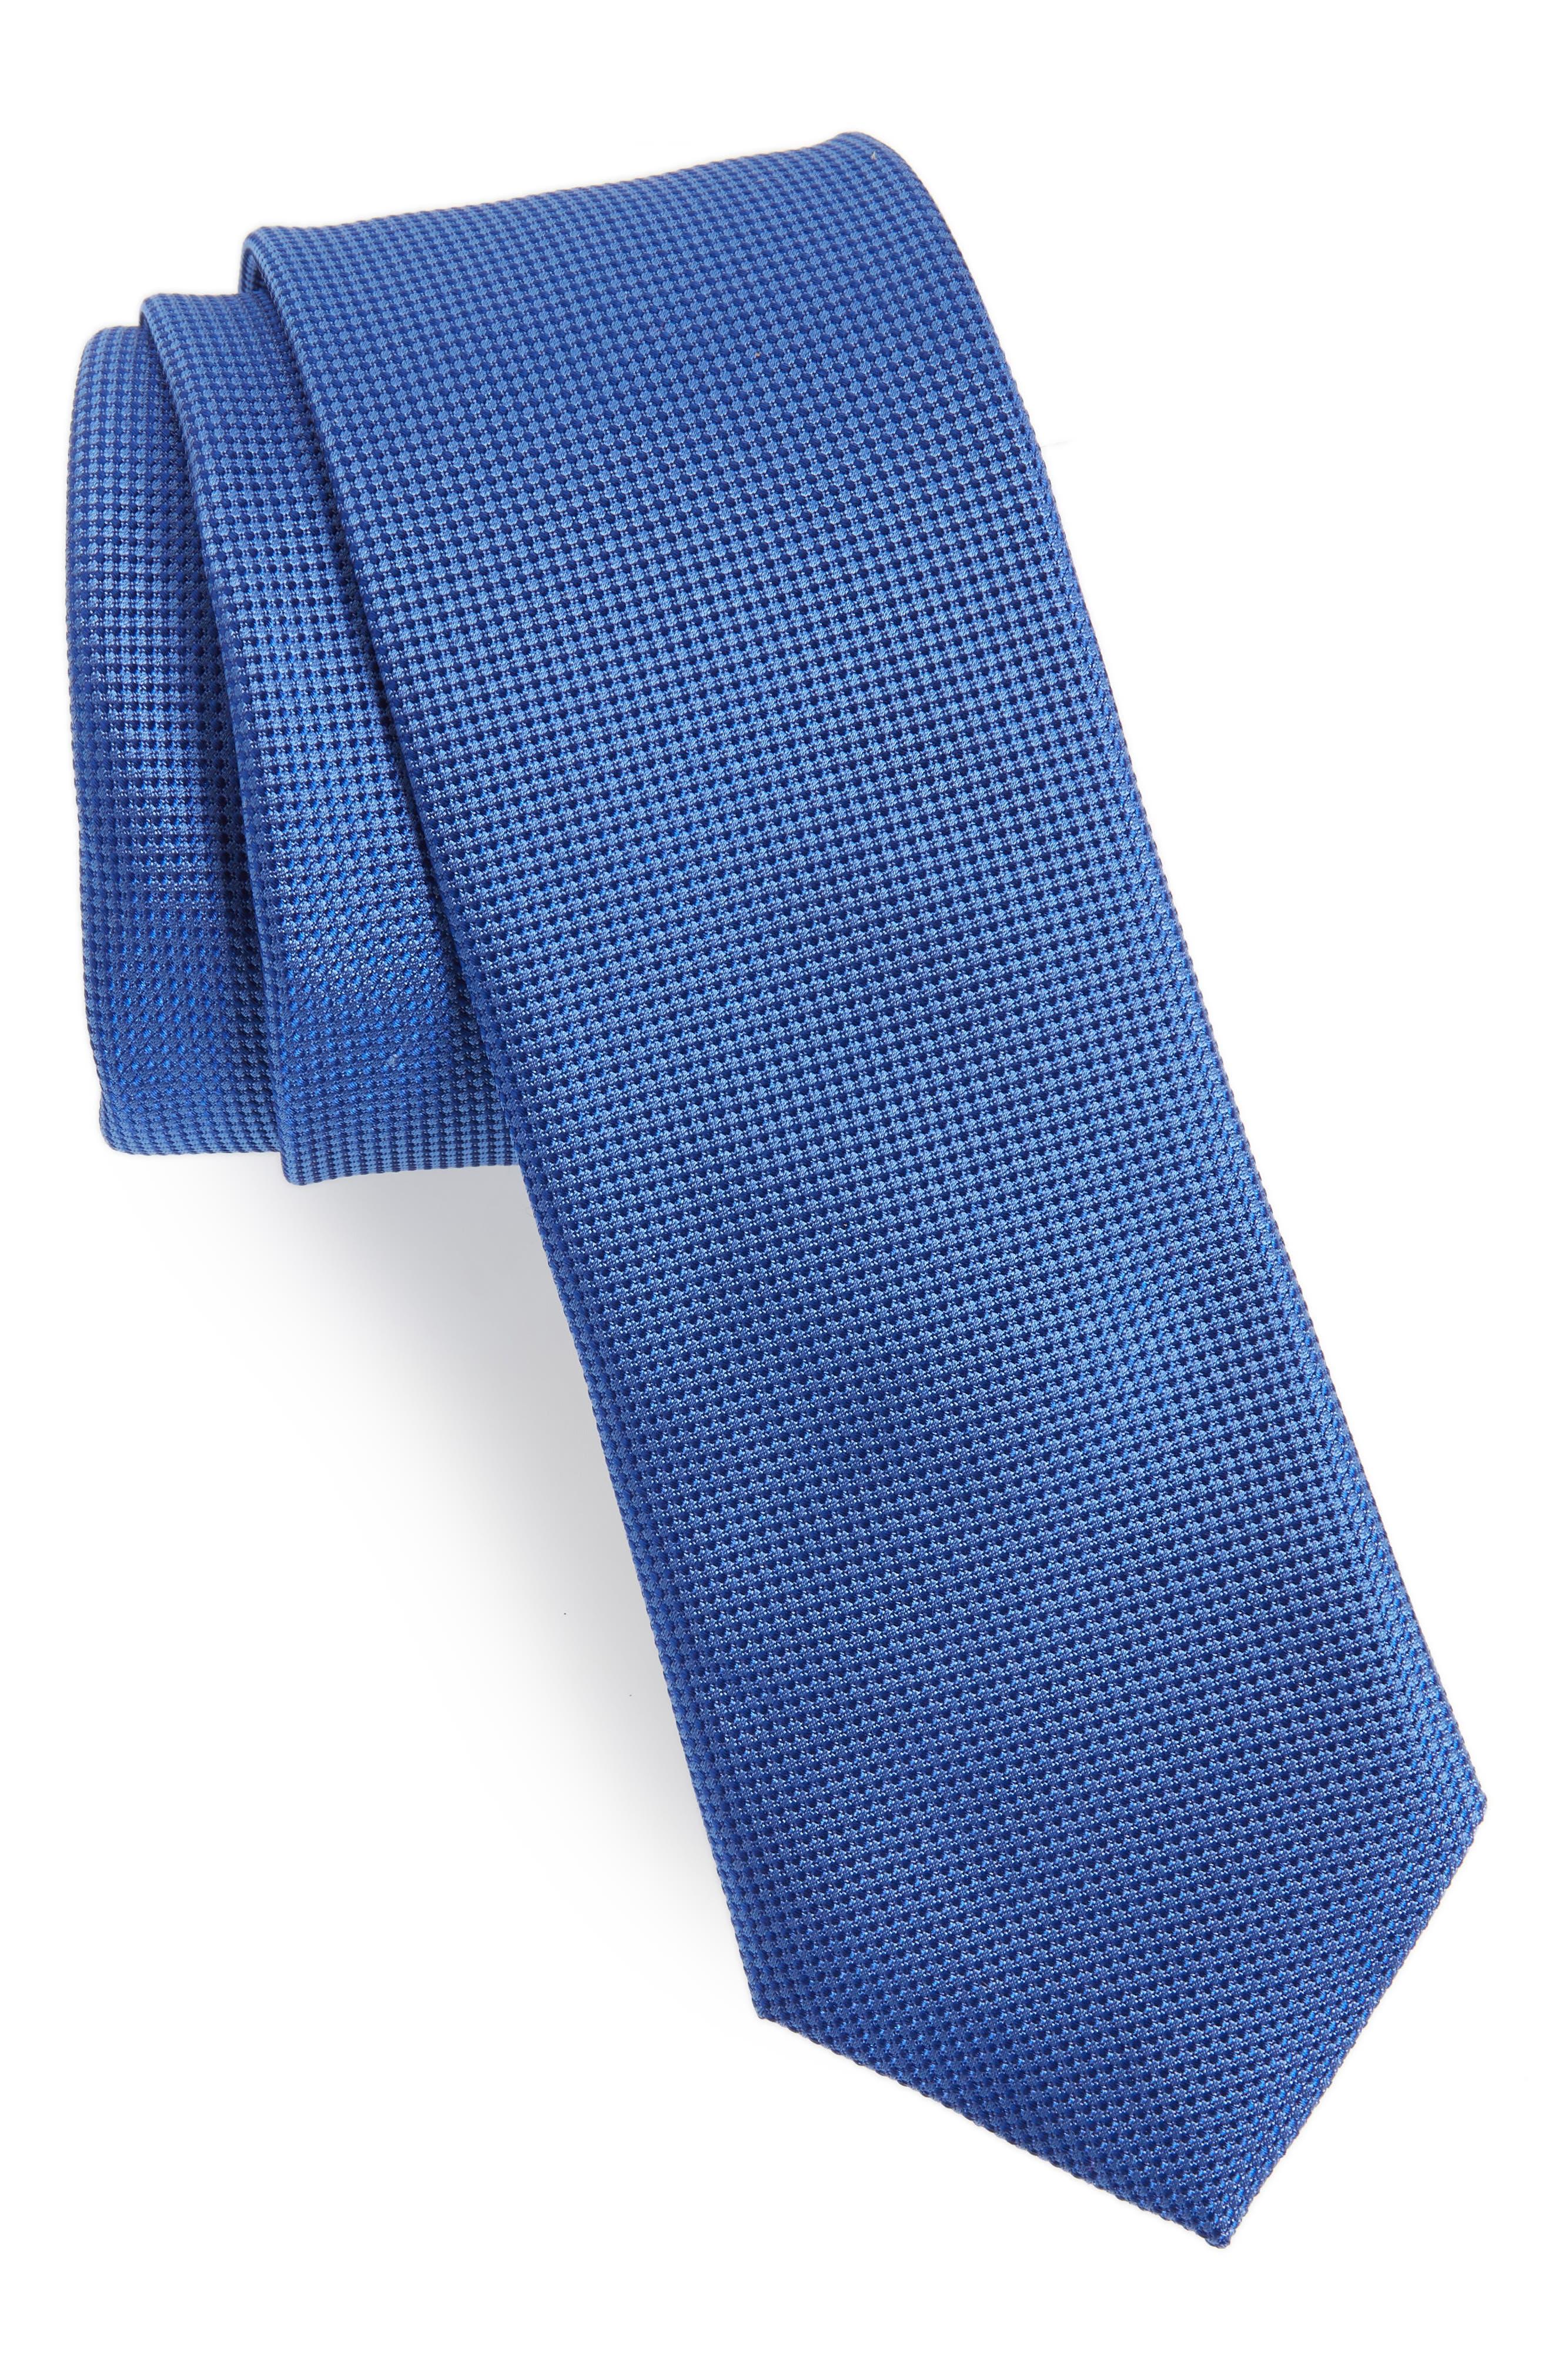 Jameswood Silk Tie,                             Main thumbnail 1, color,                             Blue